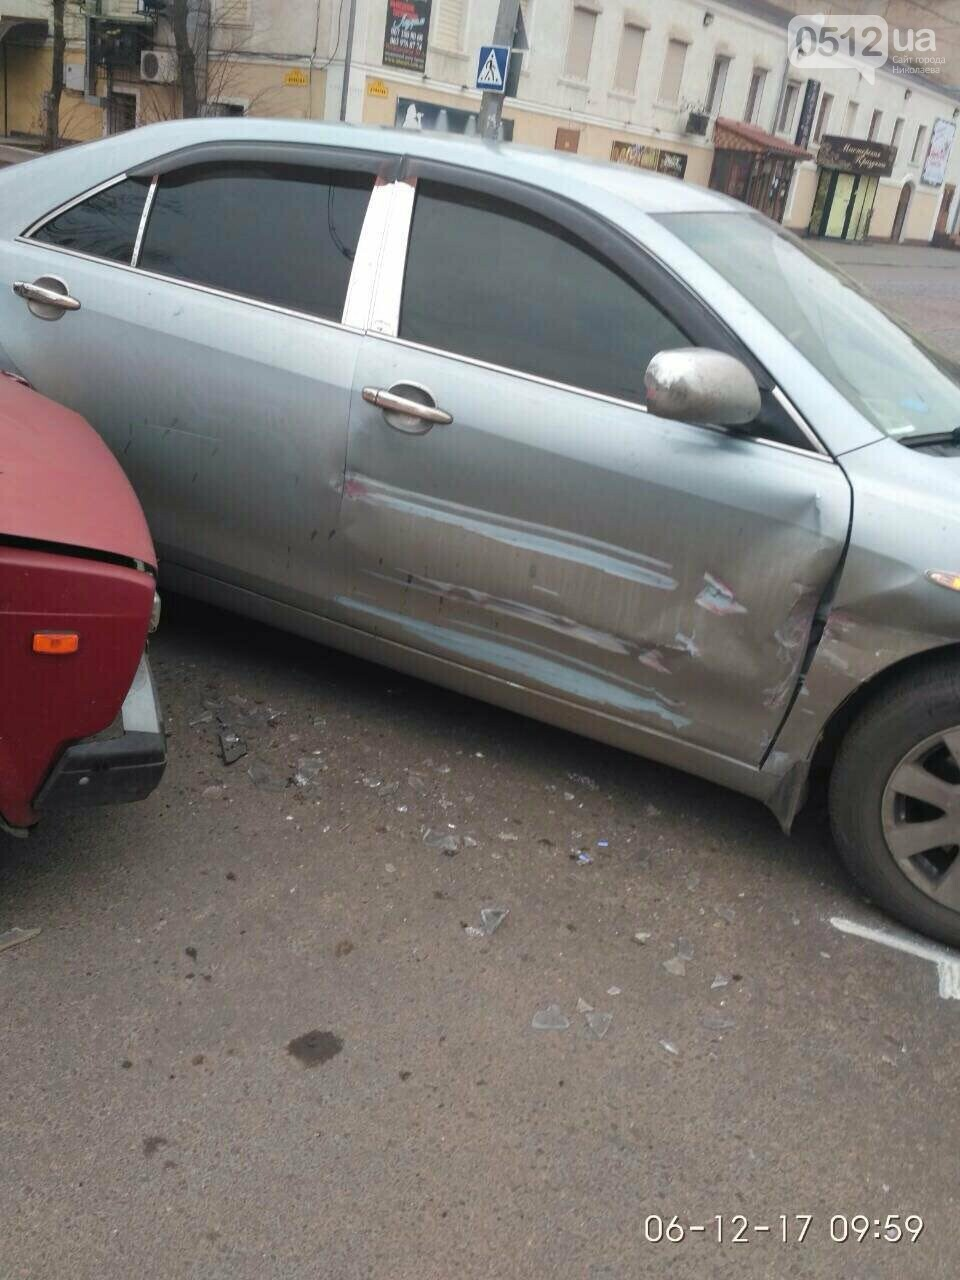 В Николаеве на равнозначном перекрестке дорог столкнулись Toyota и ВАЗ, - ФОТО, фото-3